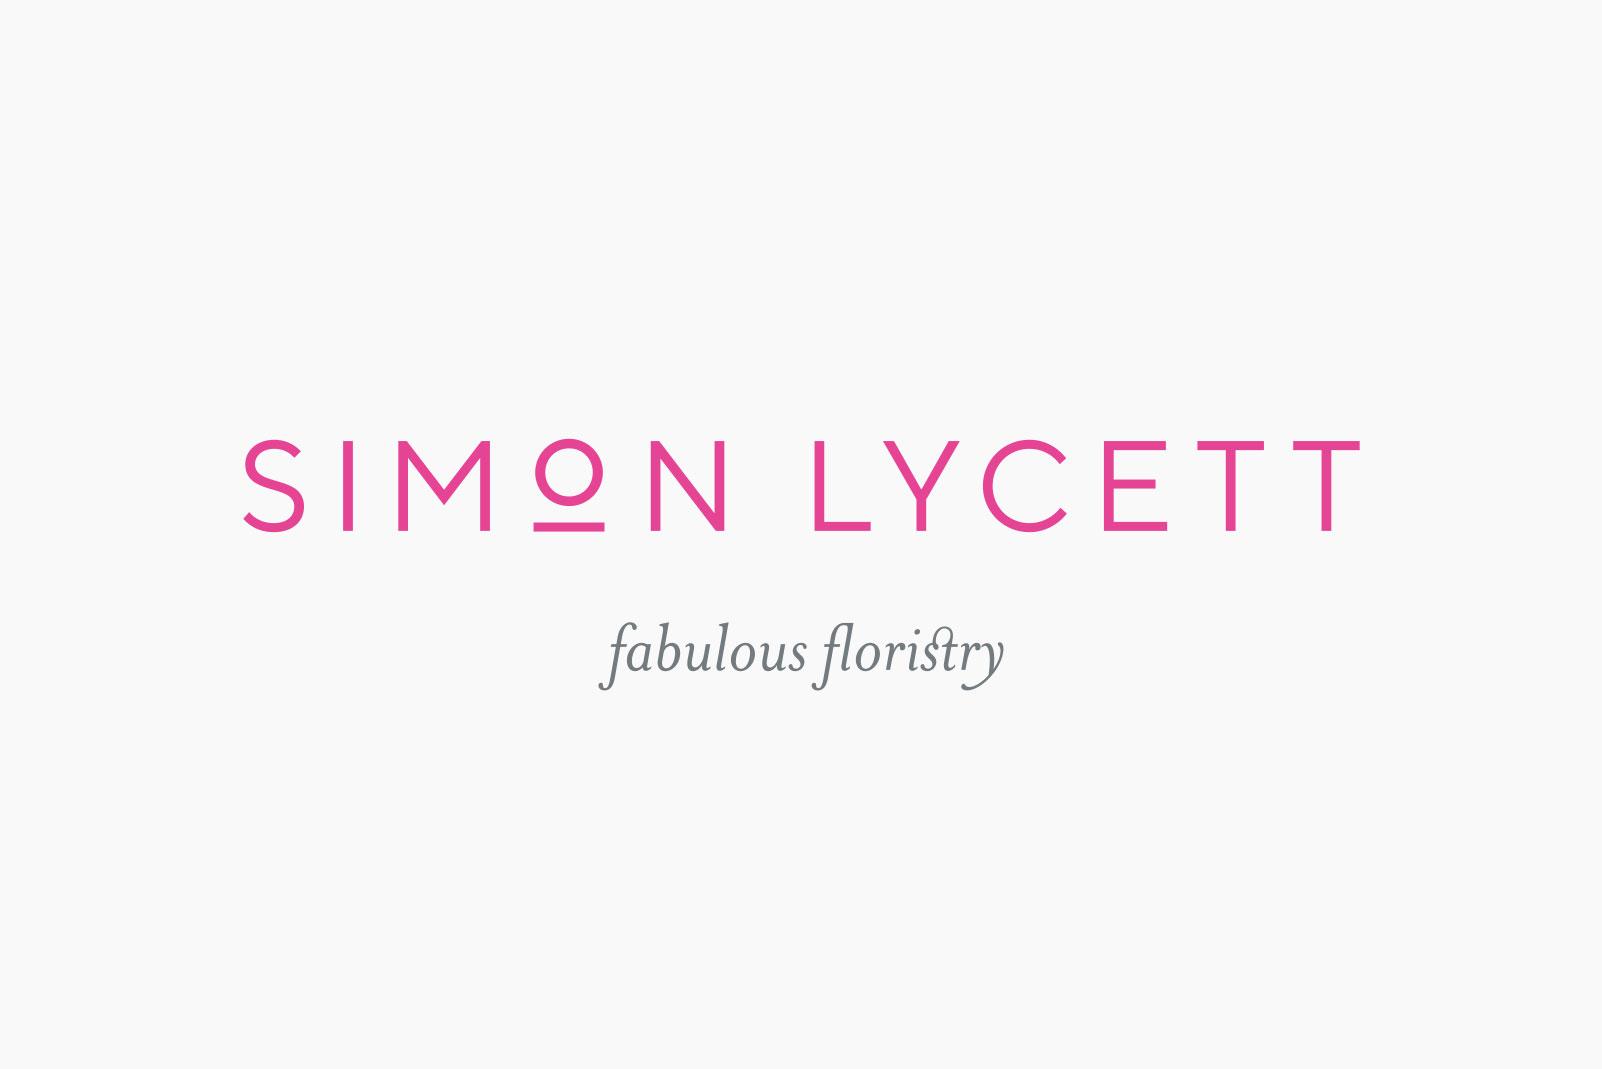 Simon-Lycett-Thumbnail.jpg